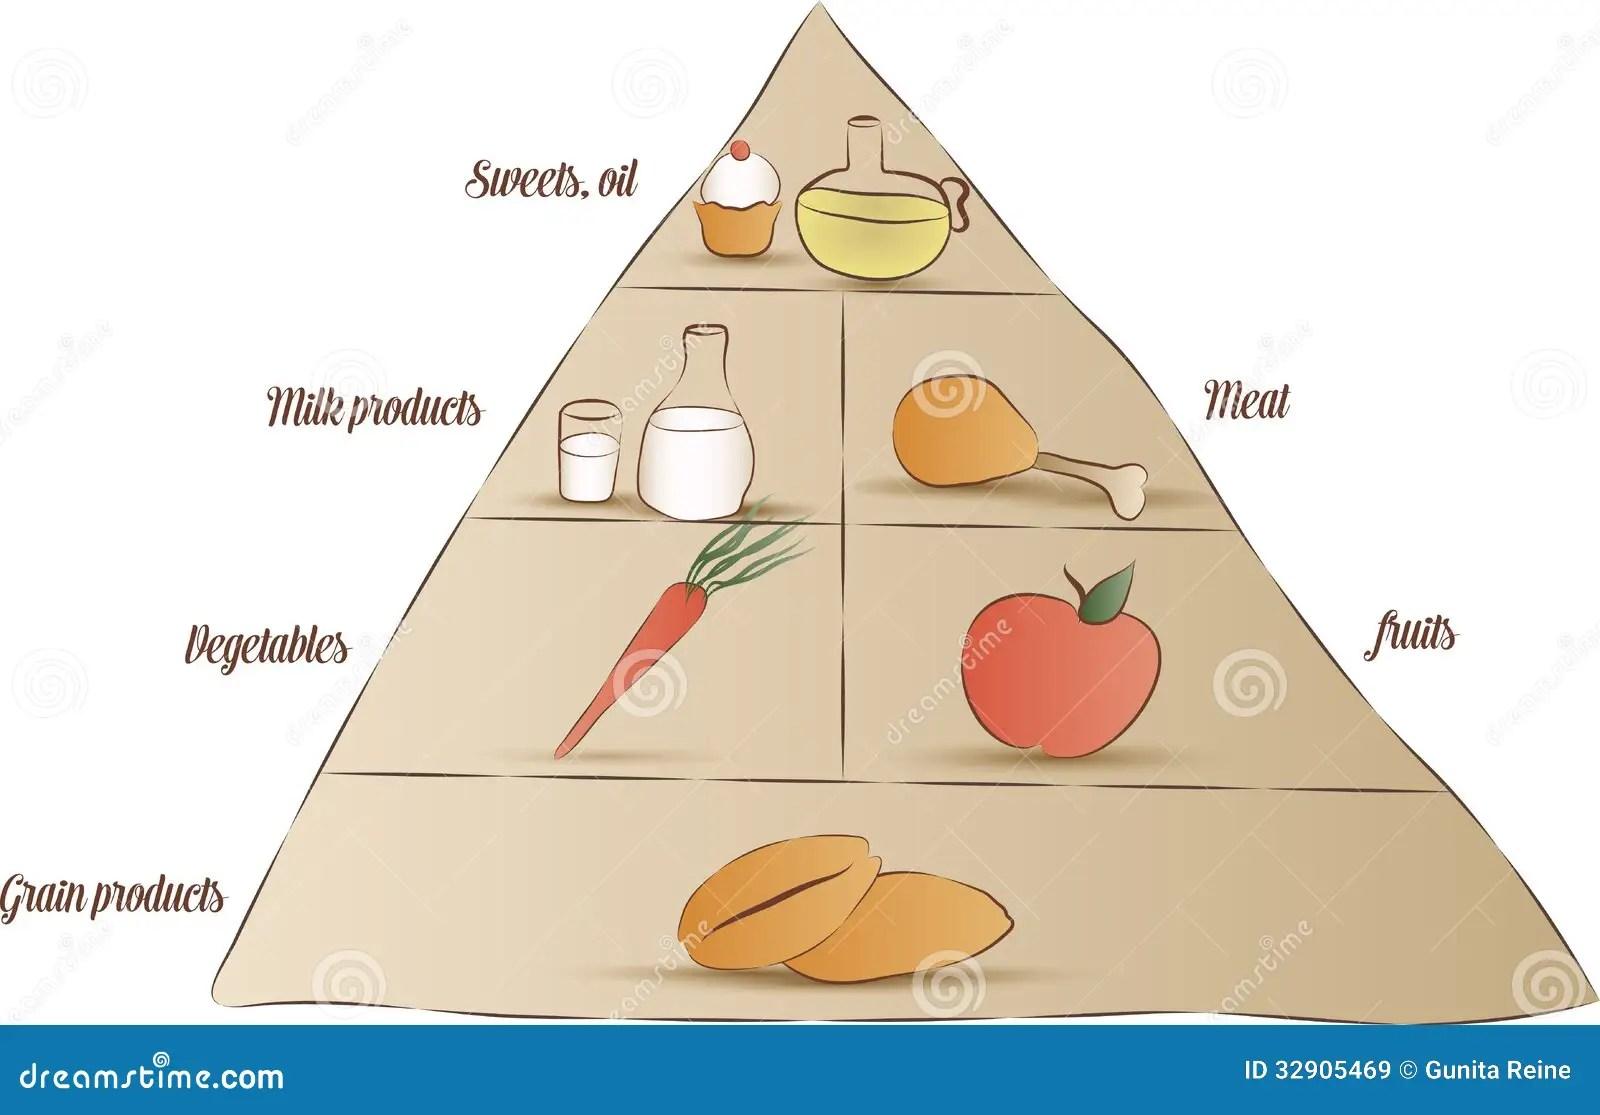 printable pyramid diagram 5 1 home theater circuit food stock vector image of grains calories